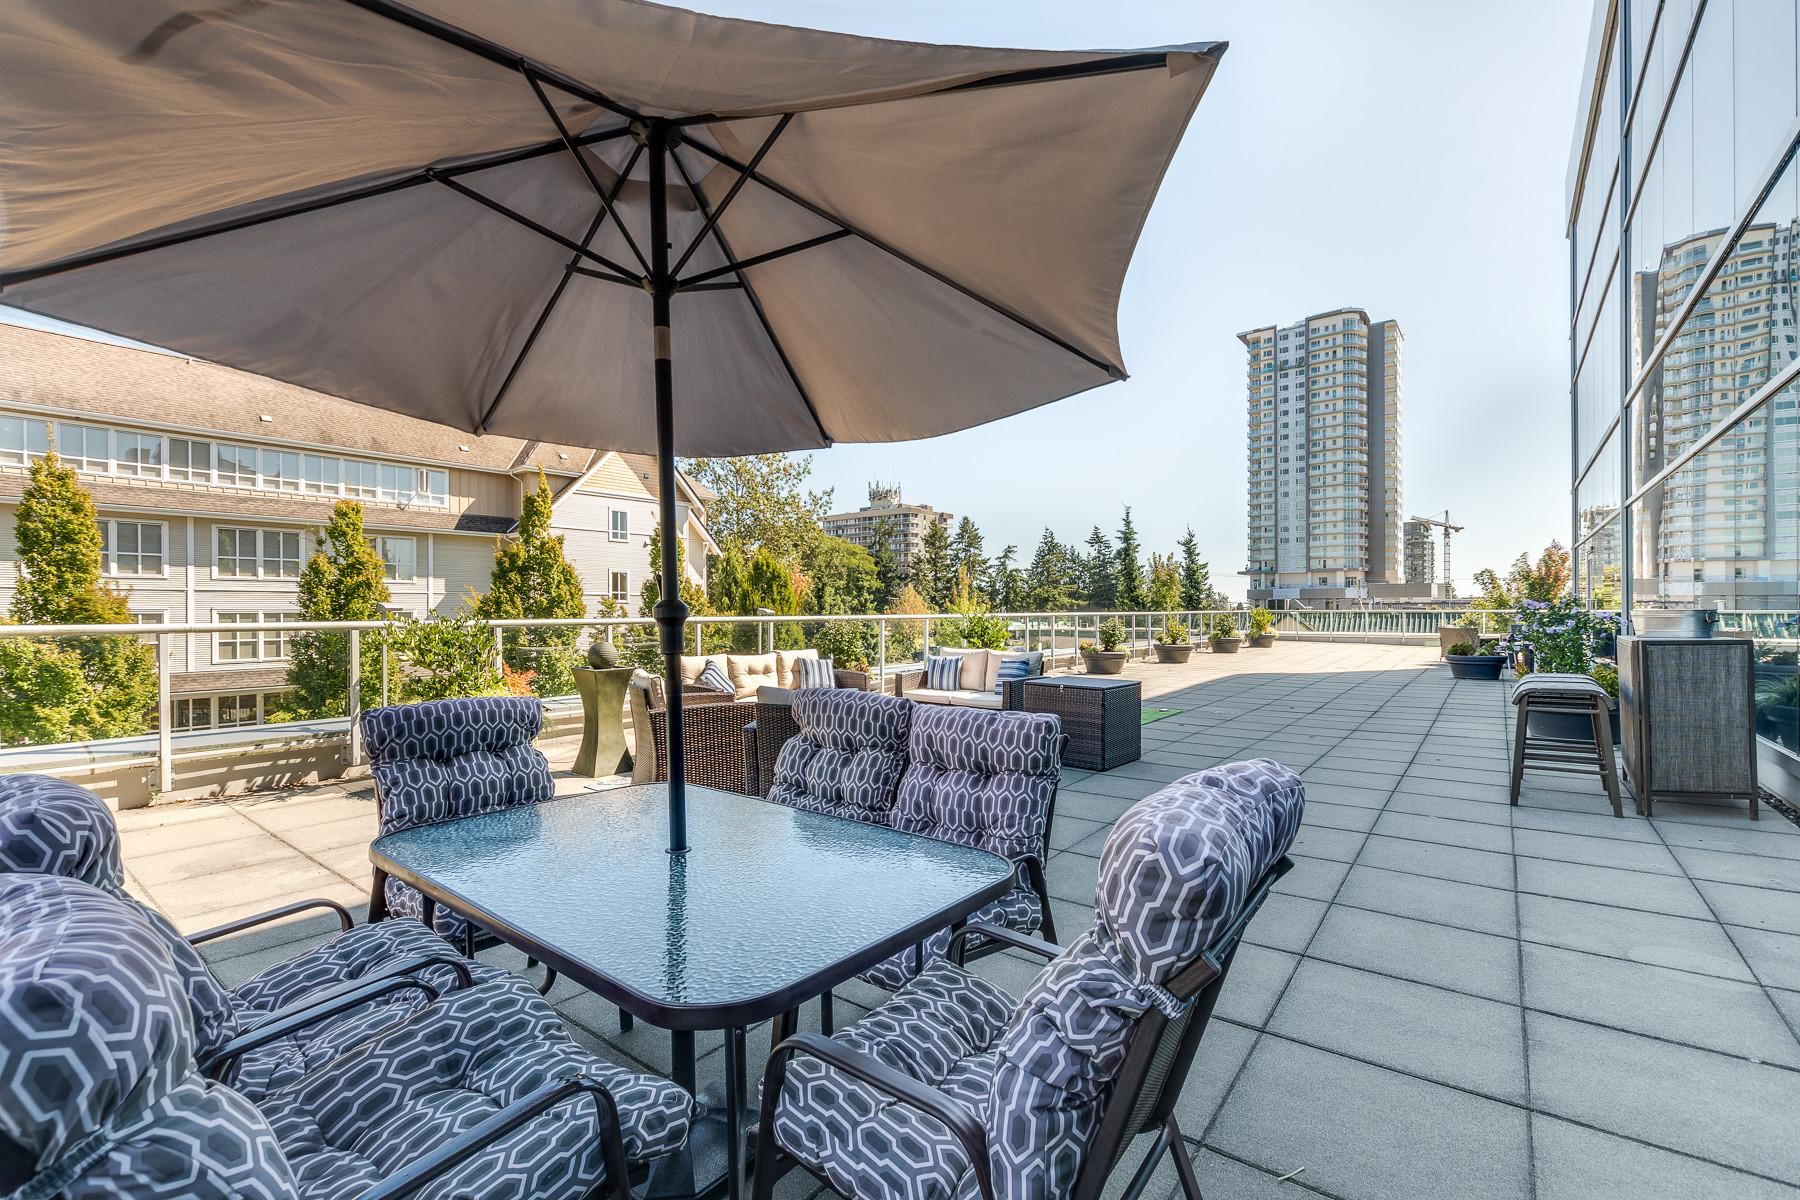 The Terrace / Outdoor Patio